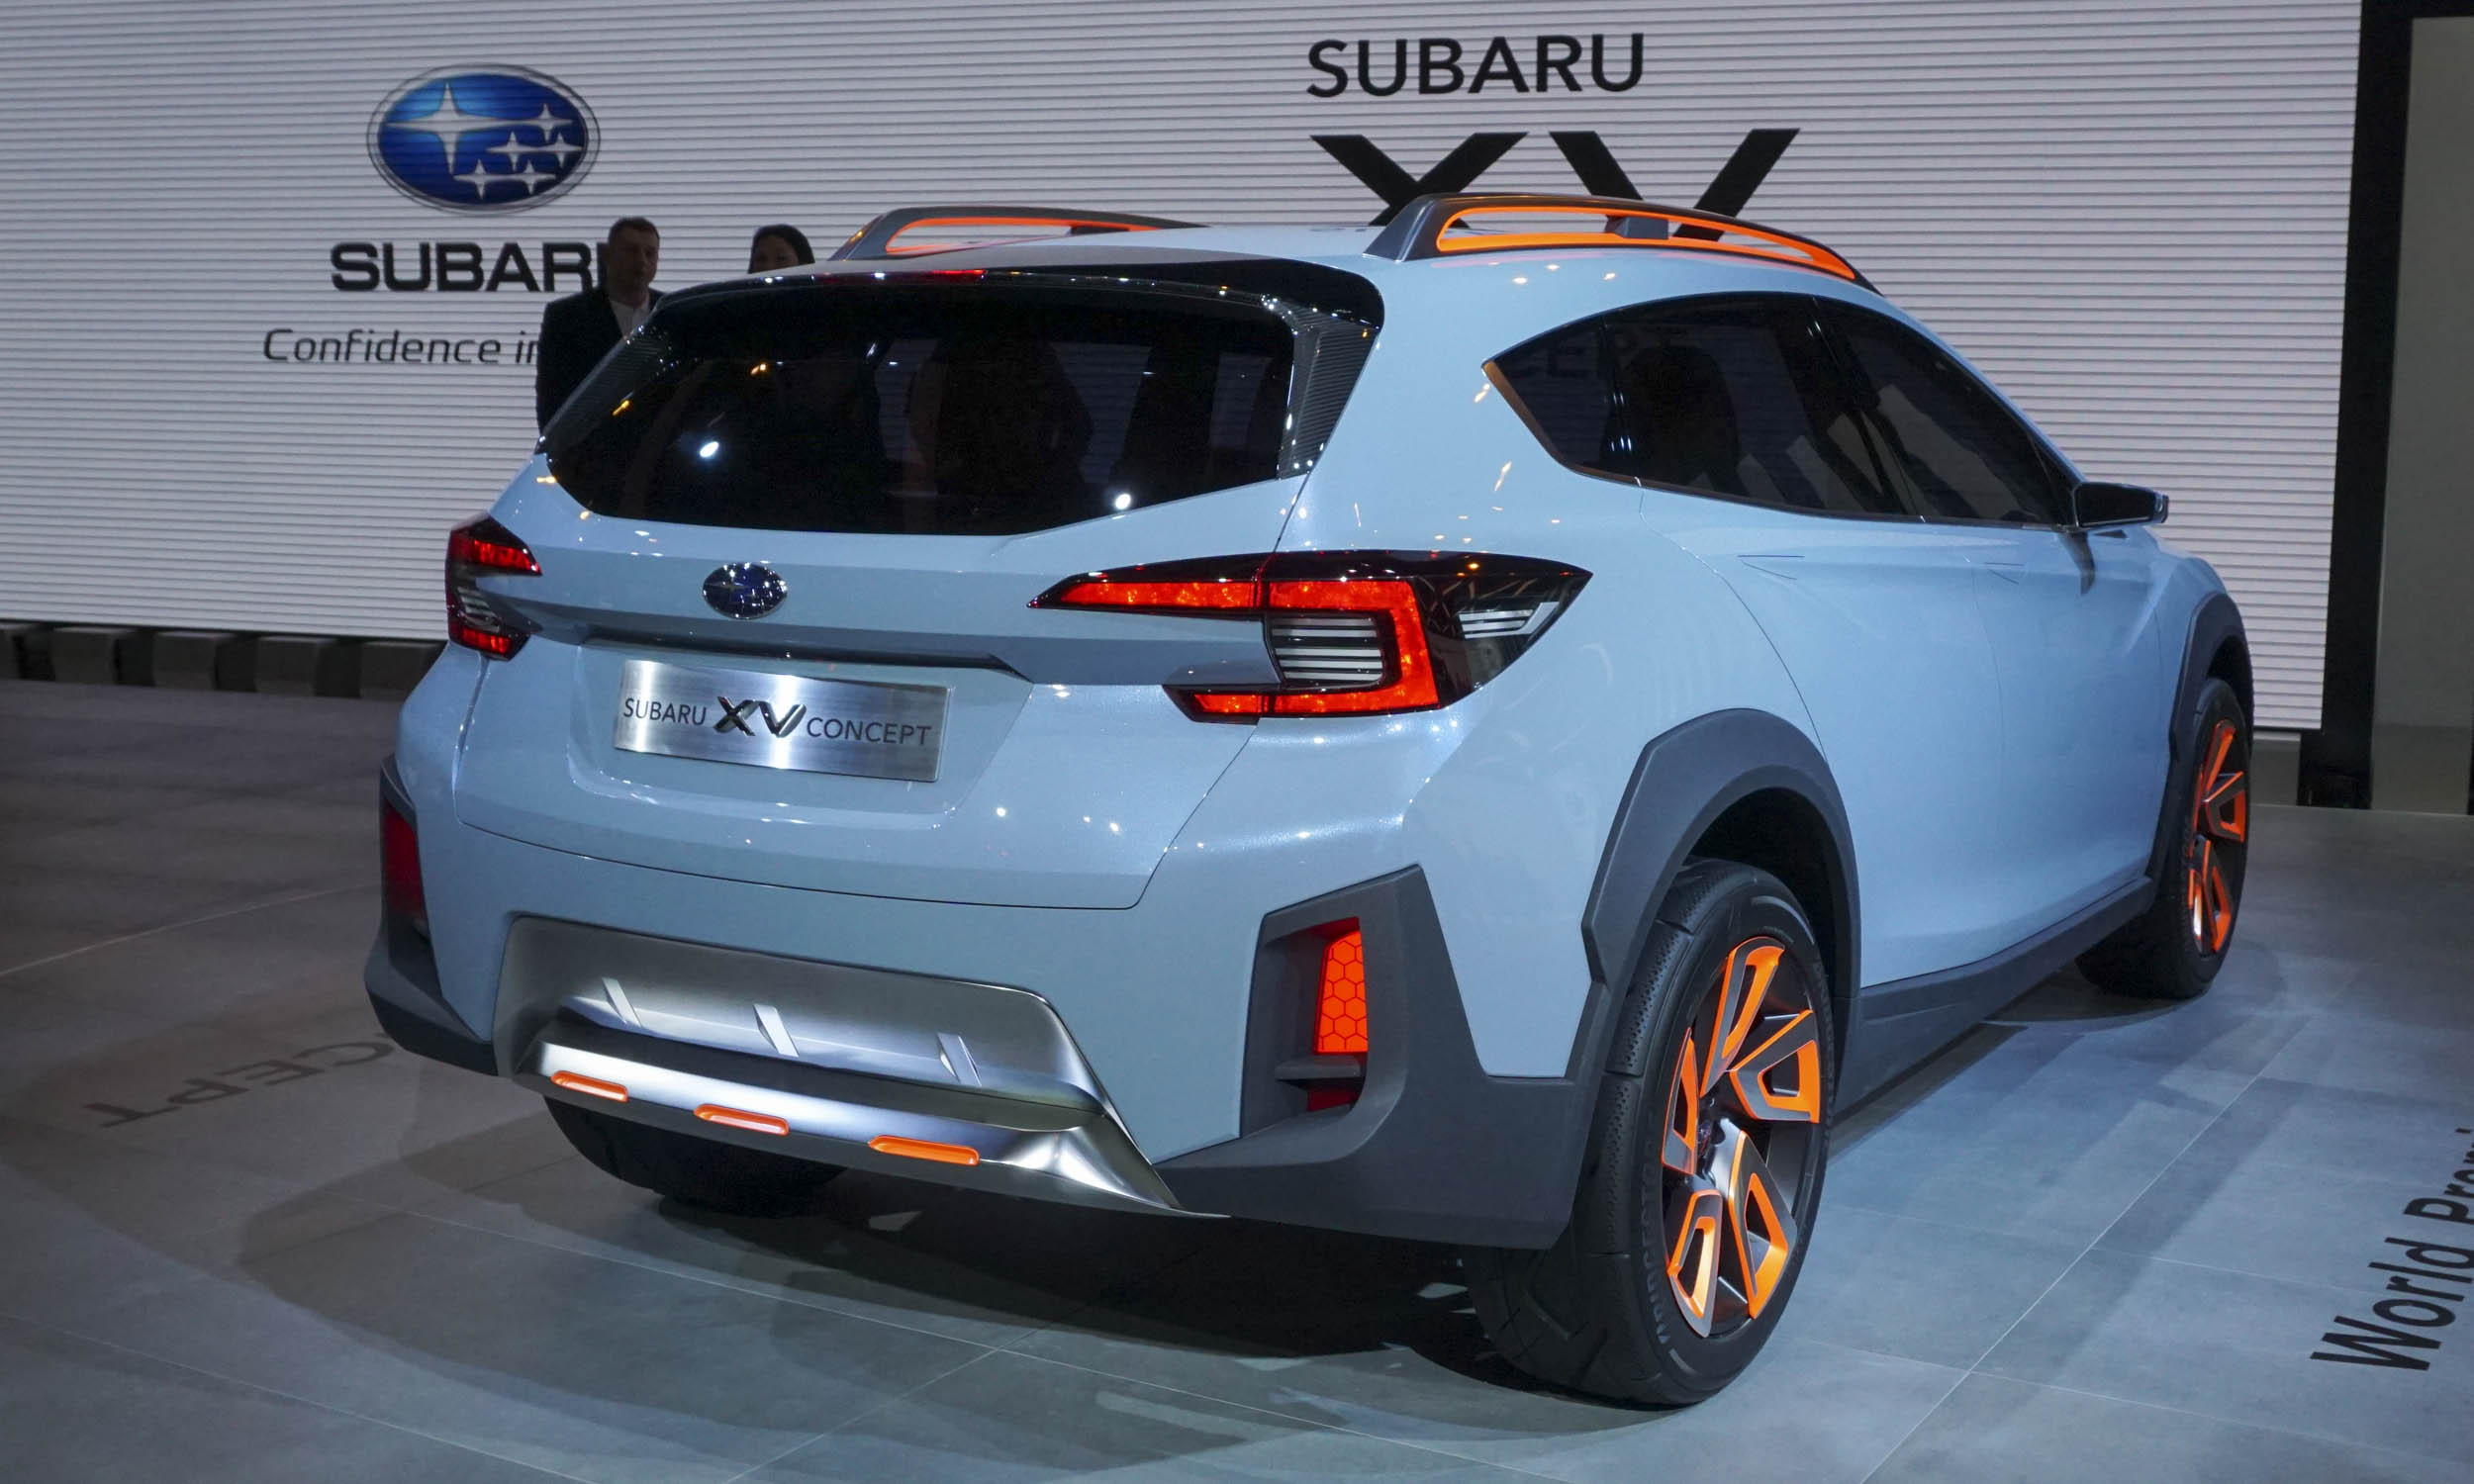 2016 Geneva Motor Show: Subaru XV Concept - » AutoNXT